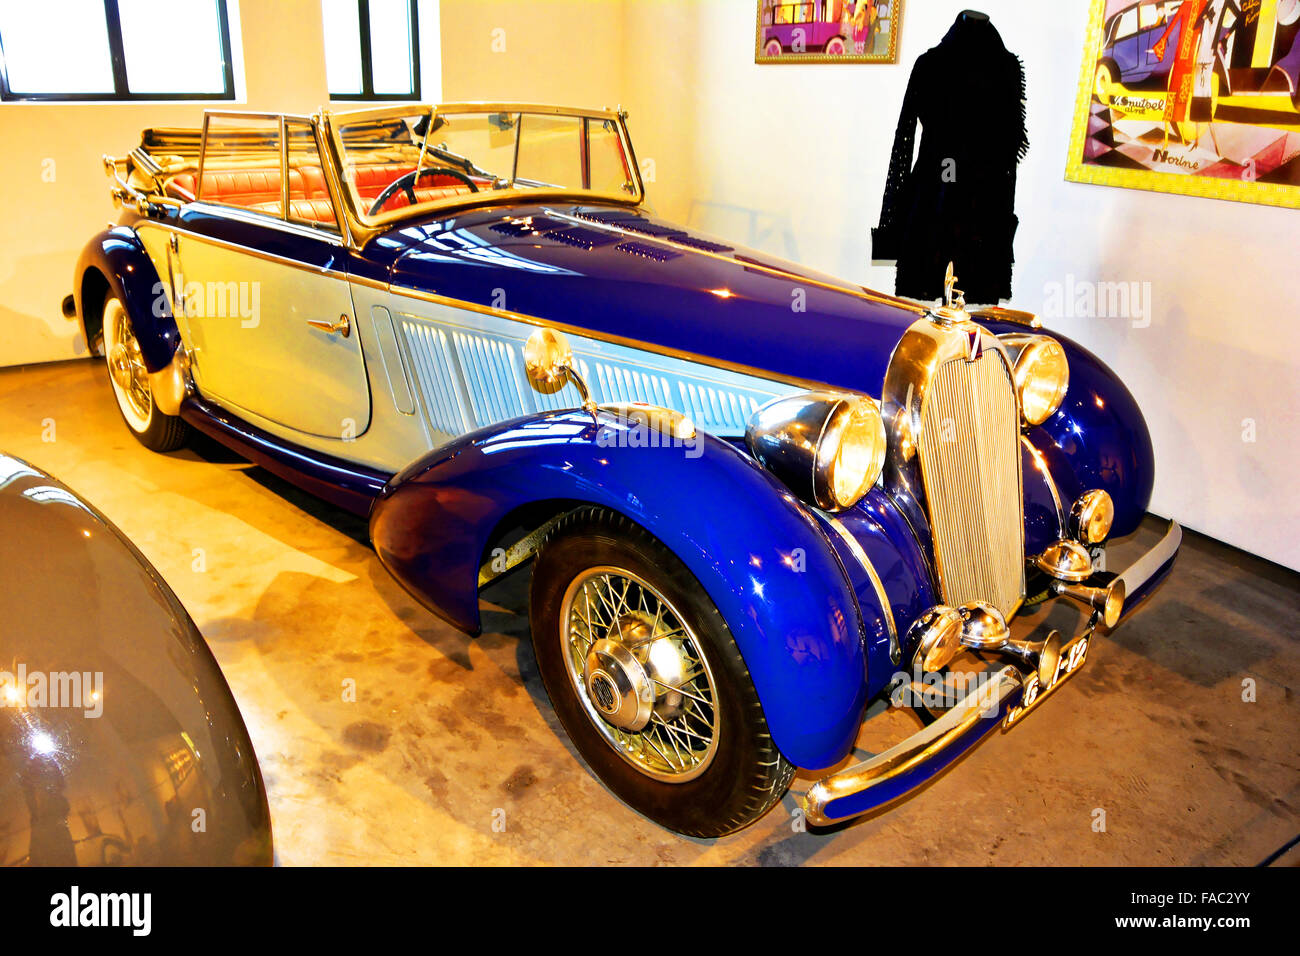 Spain Automovilistico De Malaga 1937 Talbot The Diva - Stock Image